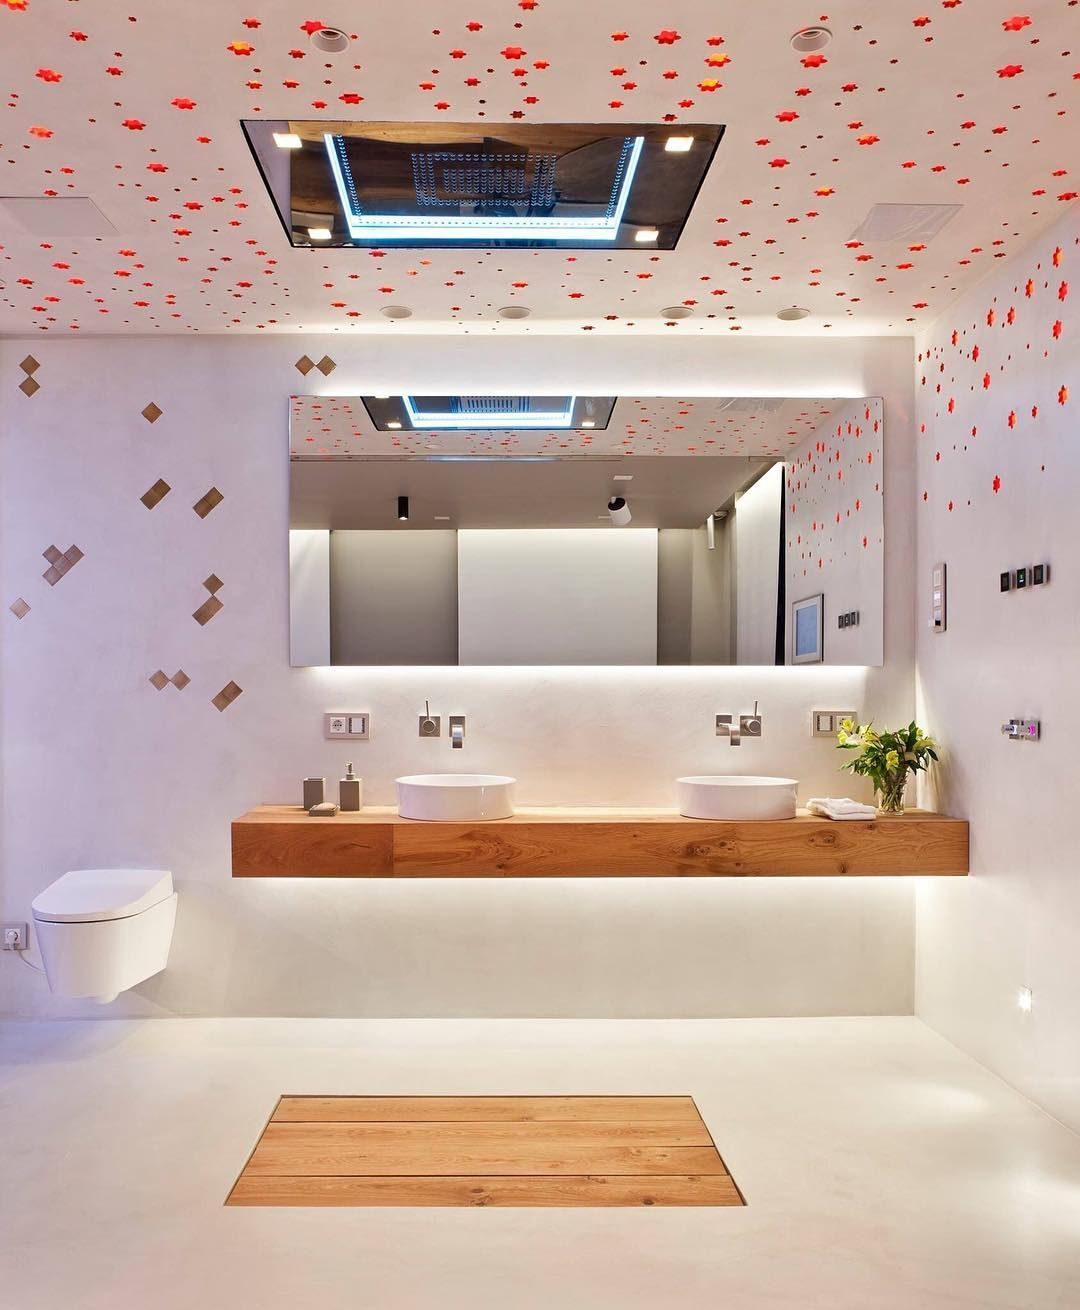 Proyecto suite de hotel en #casadecor Madrid 2016 espacio Smartclick - Gira  more info: http://ift.tt/1TvNOUG #lamparas #iluminacion #llums #decoracion #arquitectura #arquitectura interior #interiordesign #sabadell #barcelona #decoración  #lights #ambience #lighting #architecture #design #decor #ideas #lightingdesign #homedesign #proyectos #interiorprojects #bcn #instahome #lamps #light #luz #luces #restaurantes #casa #home by sbdiluminacion http://discoverdmci.com